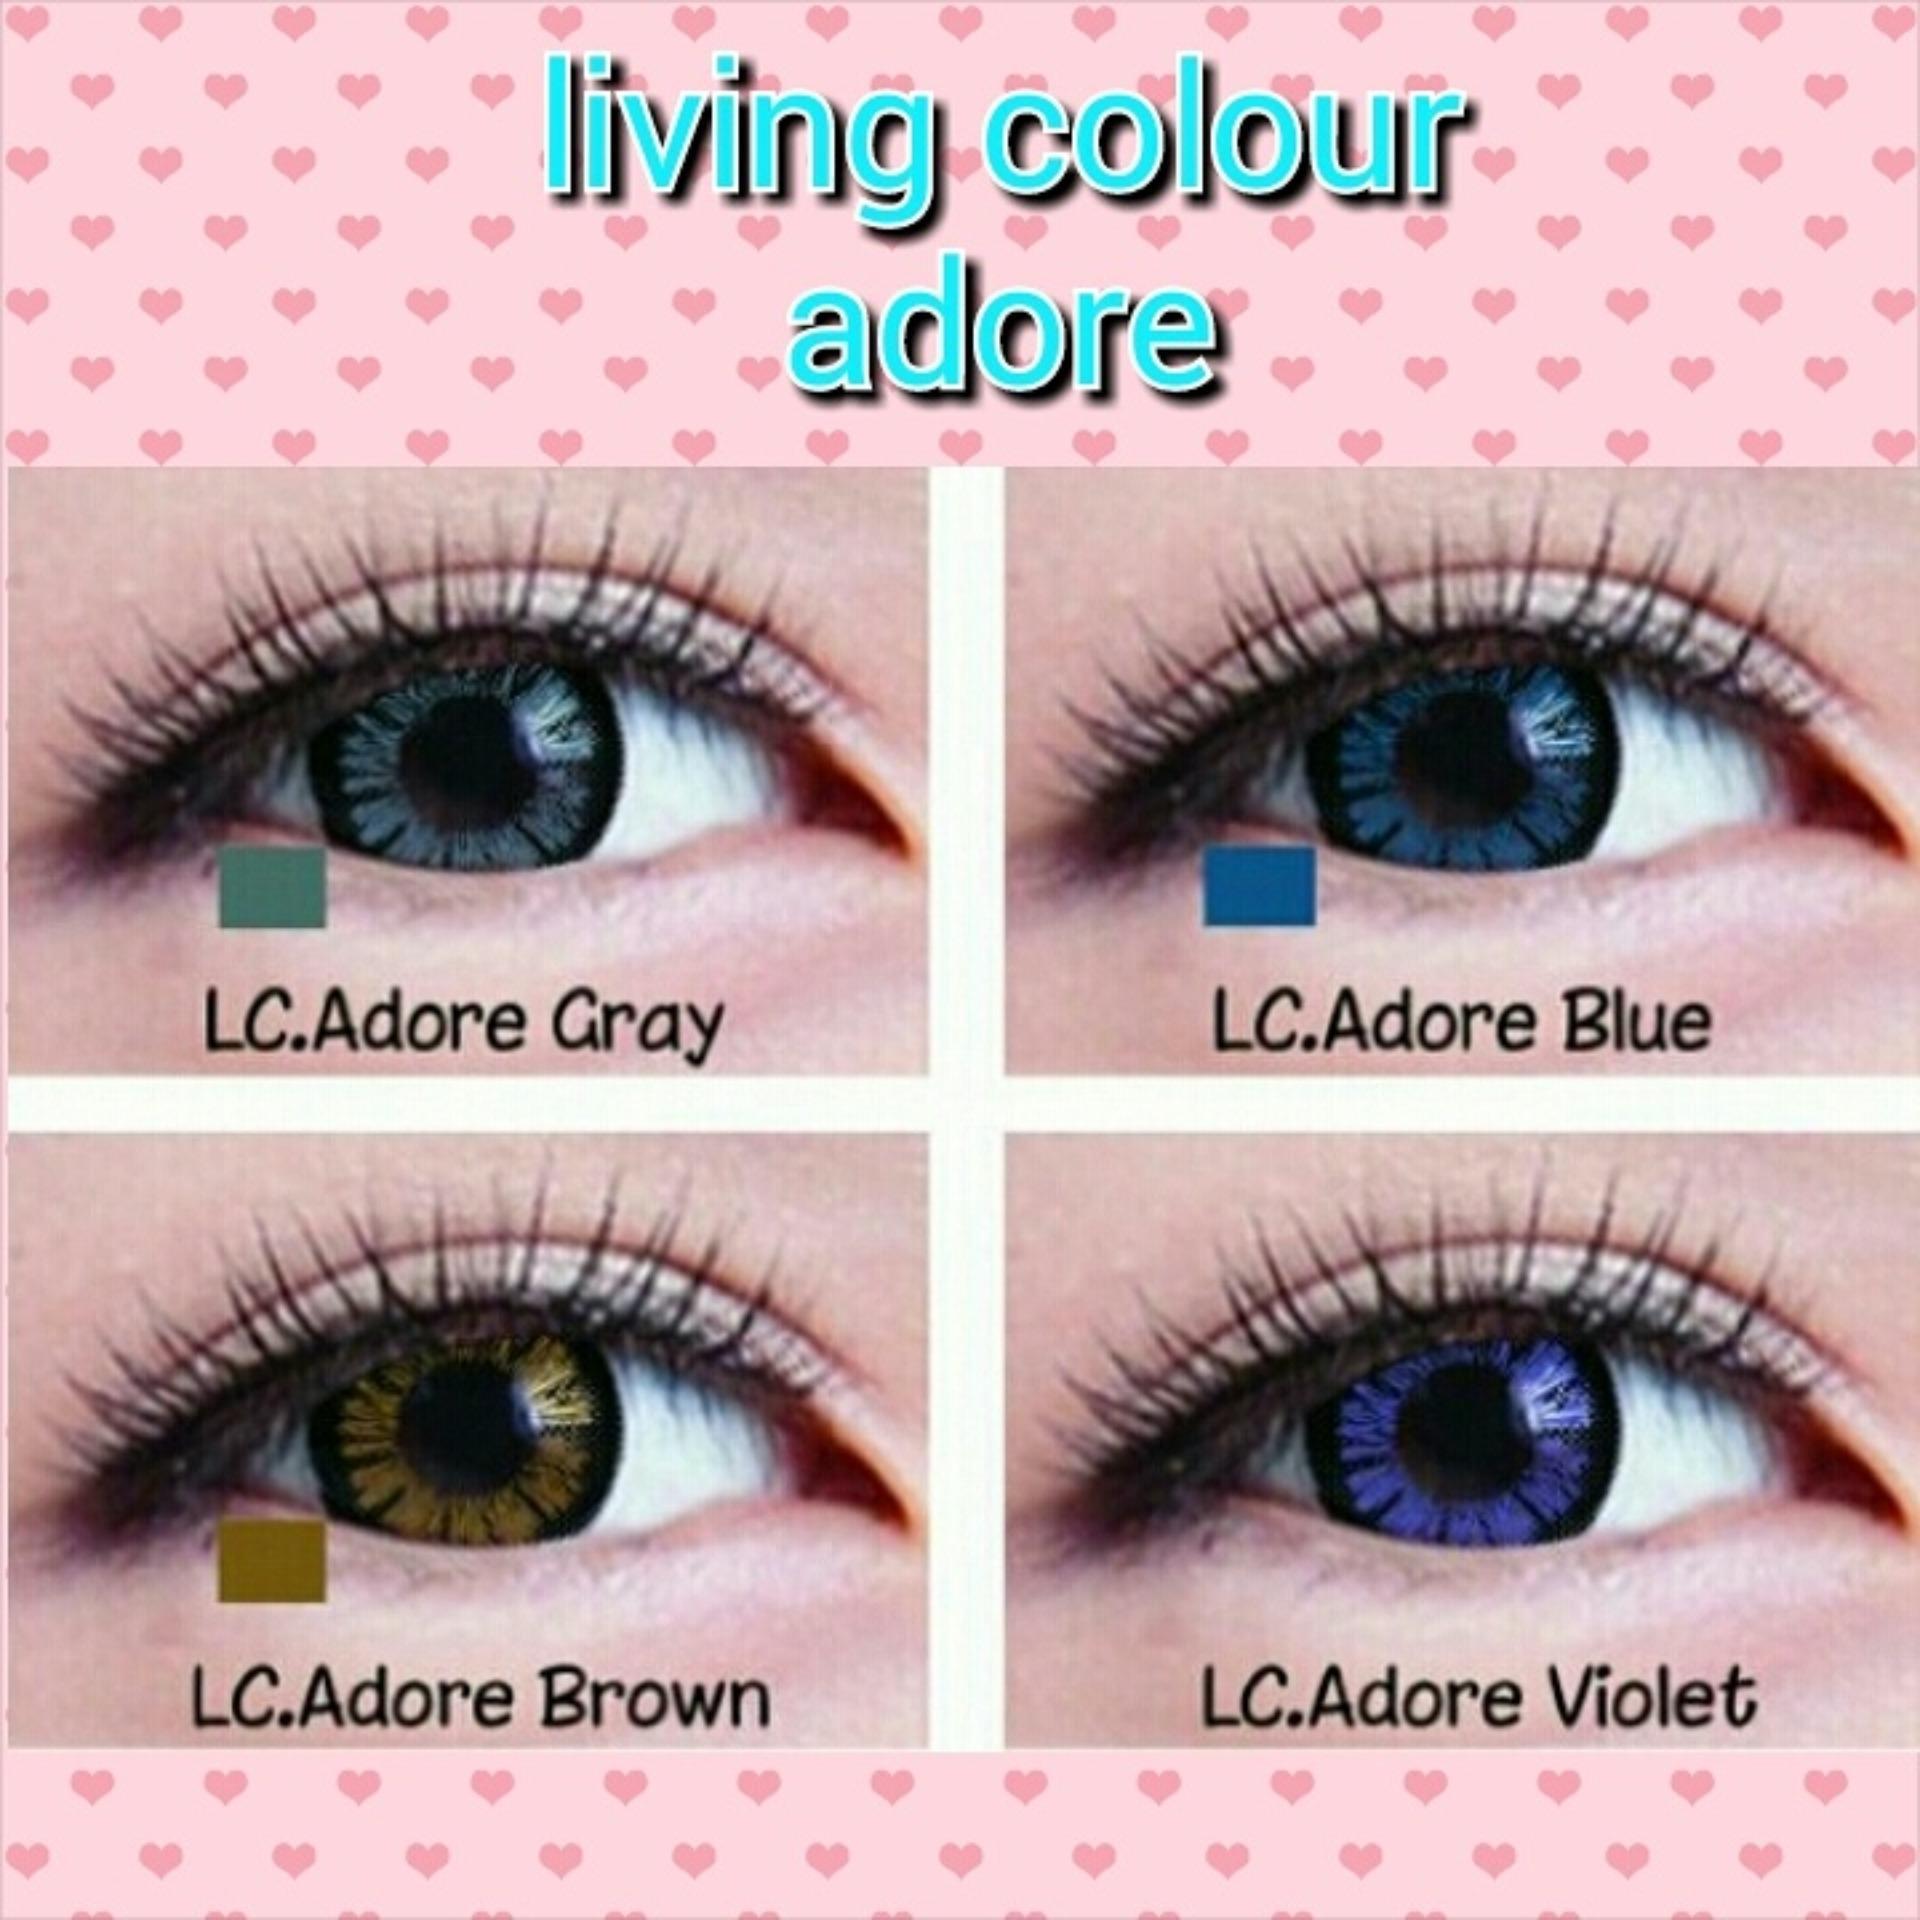 softlens-living-color-tone-adore-angel-lovely-soft-lens -colour-brown-free-lenscase-1-pcs-1515691057-02615251-6bfc5e784a13a0b25eb777a2f268aee5.jpg